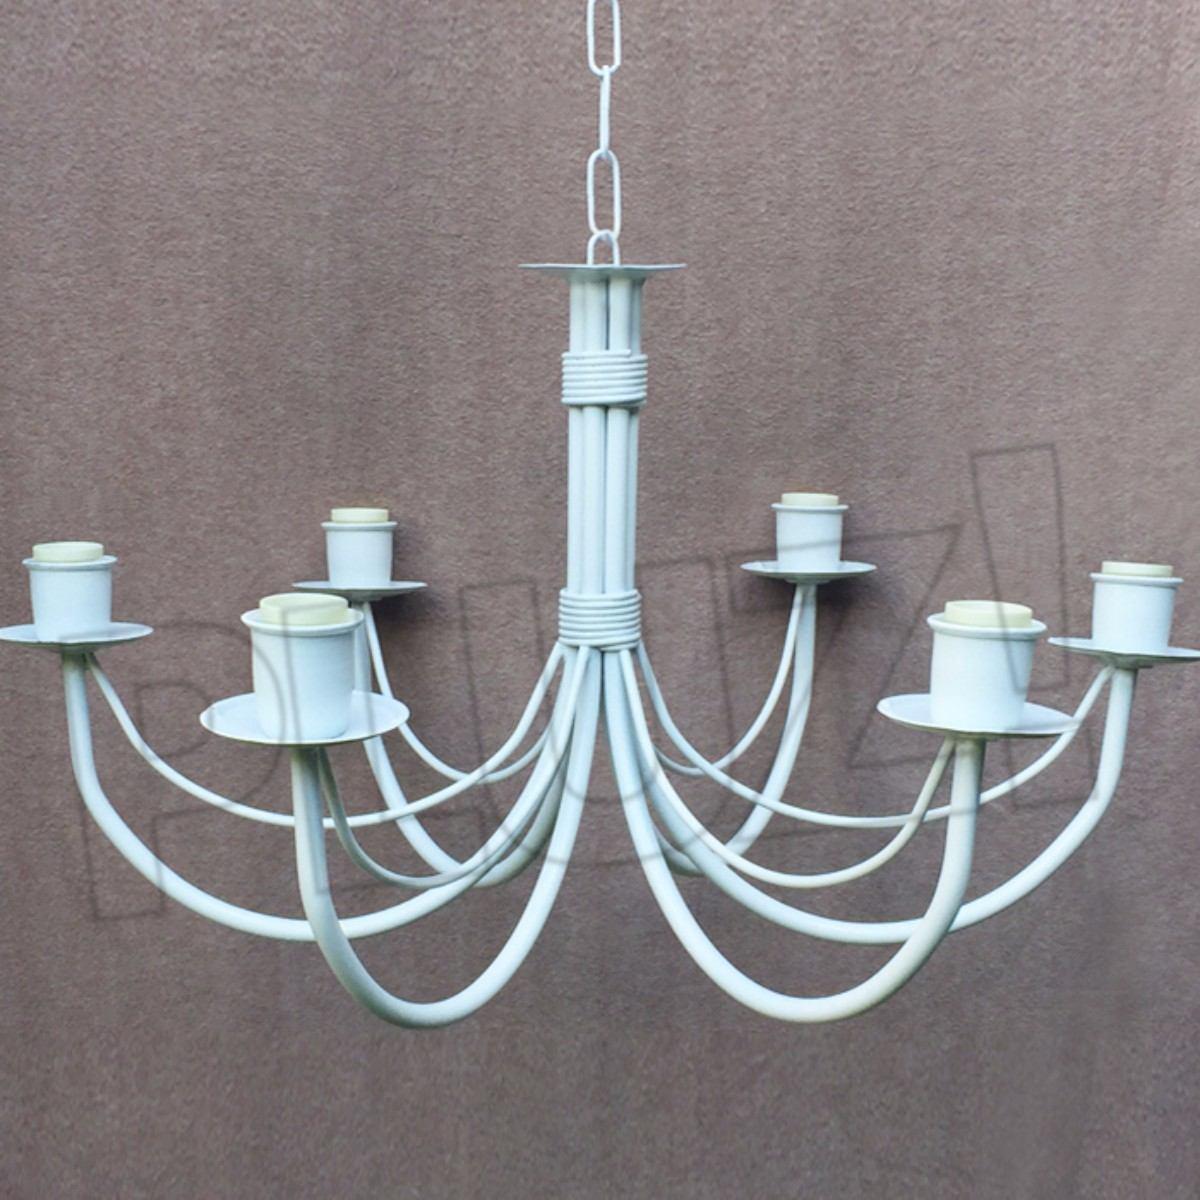 Lámpara Colgante Araña 6 luces Hierro Blanco